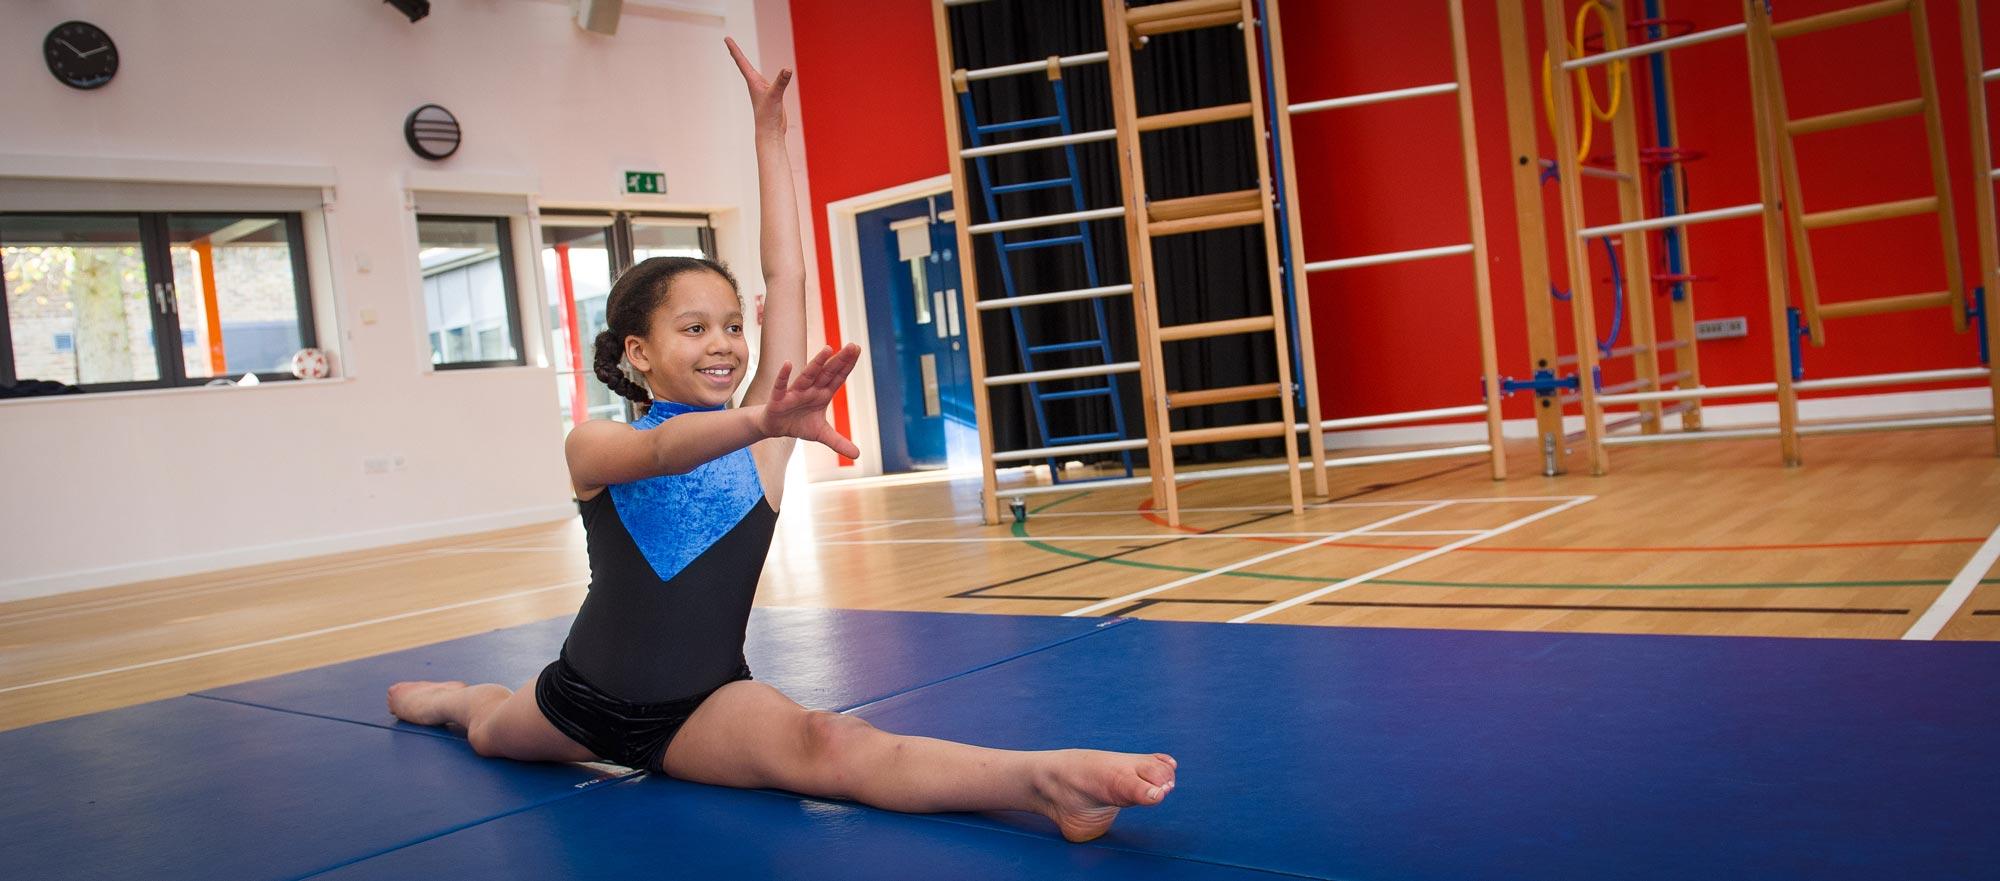 girl-gymnastics-split